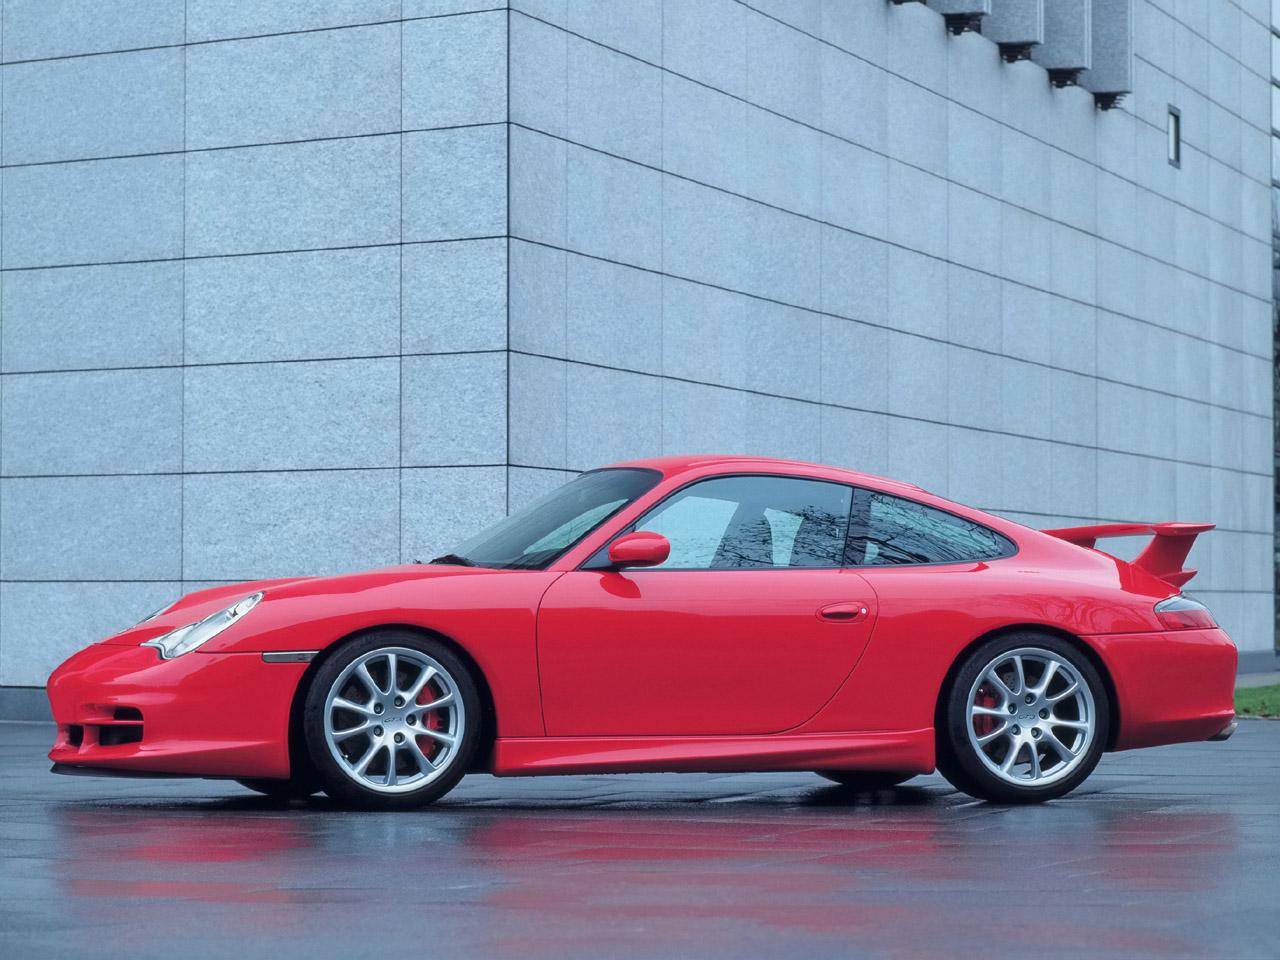 2004 Porsche 911 Information And Photos Zombiedrive